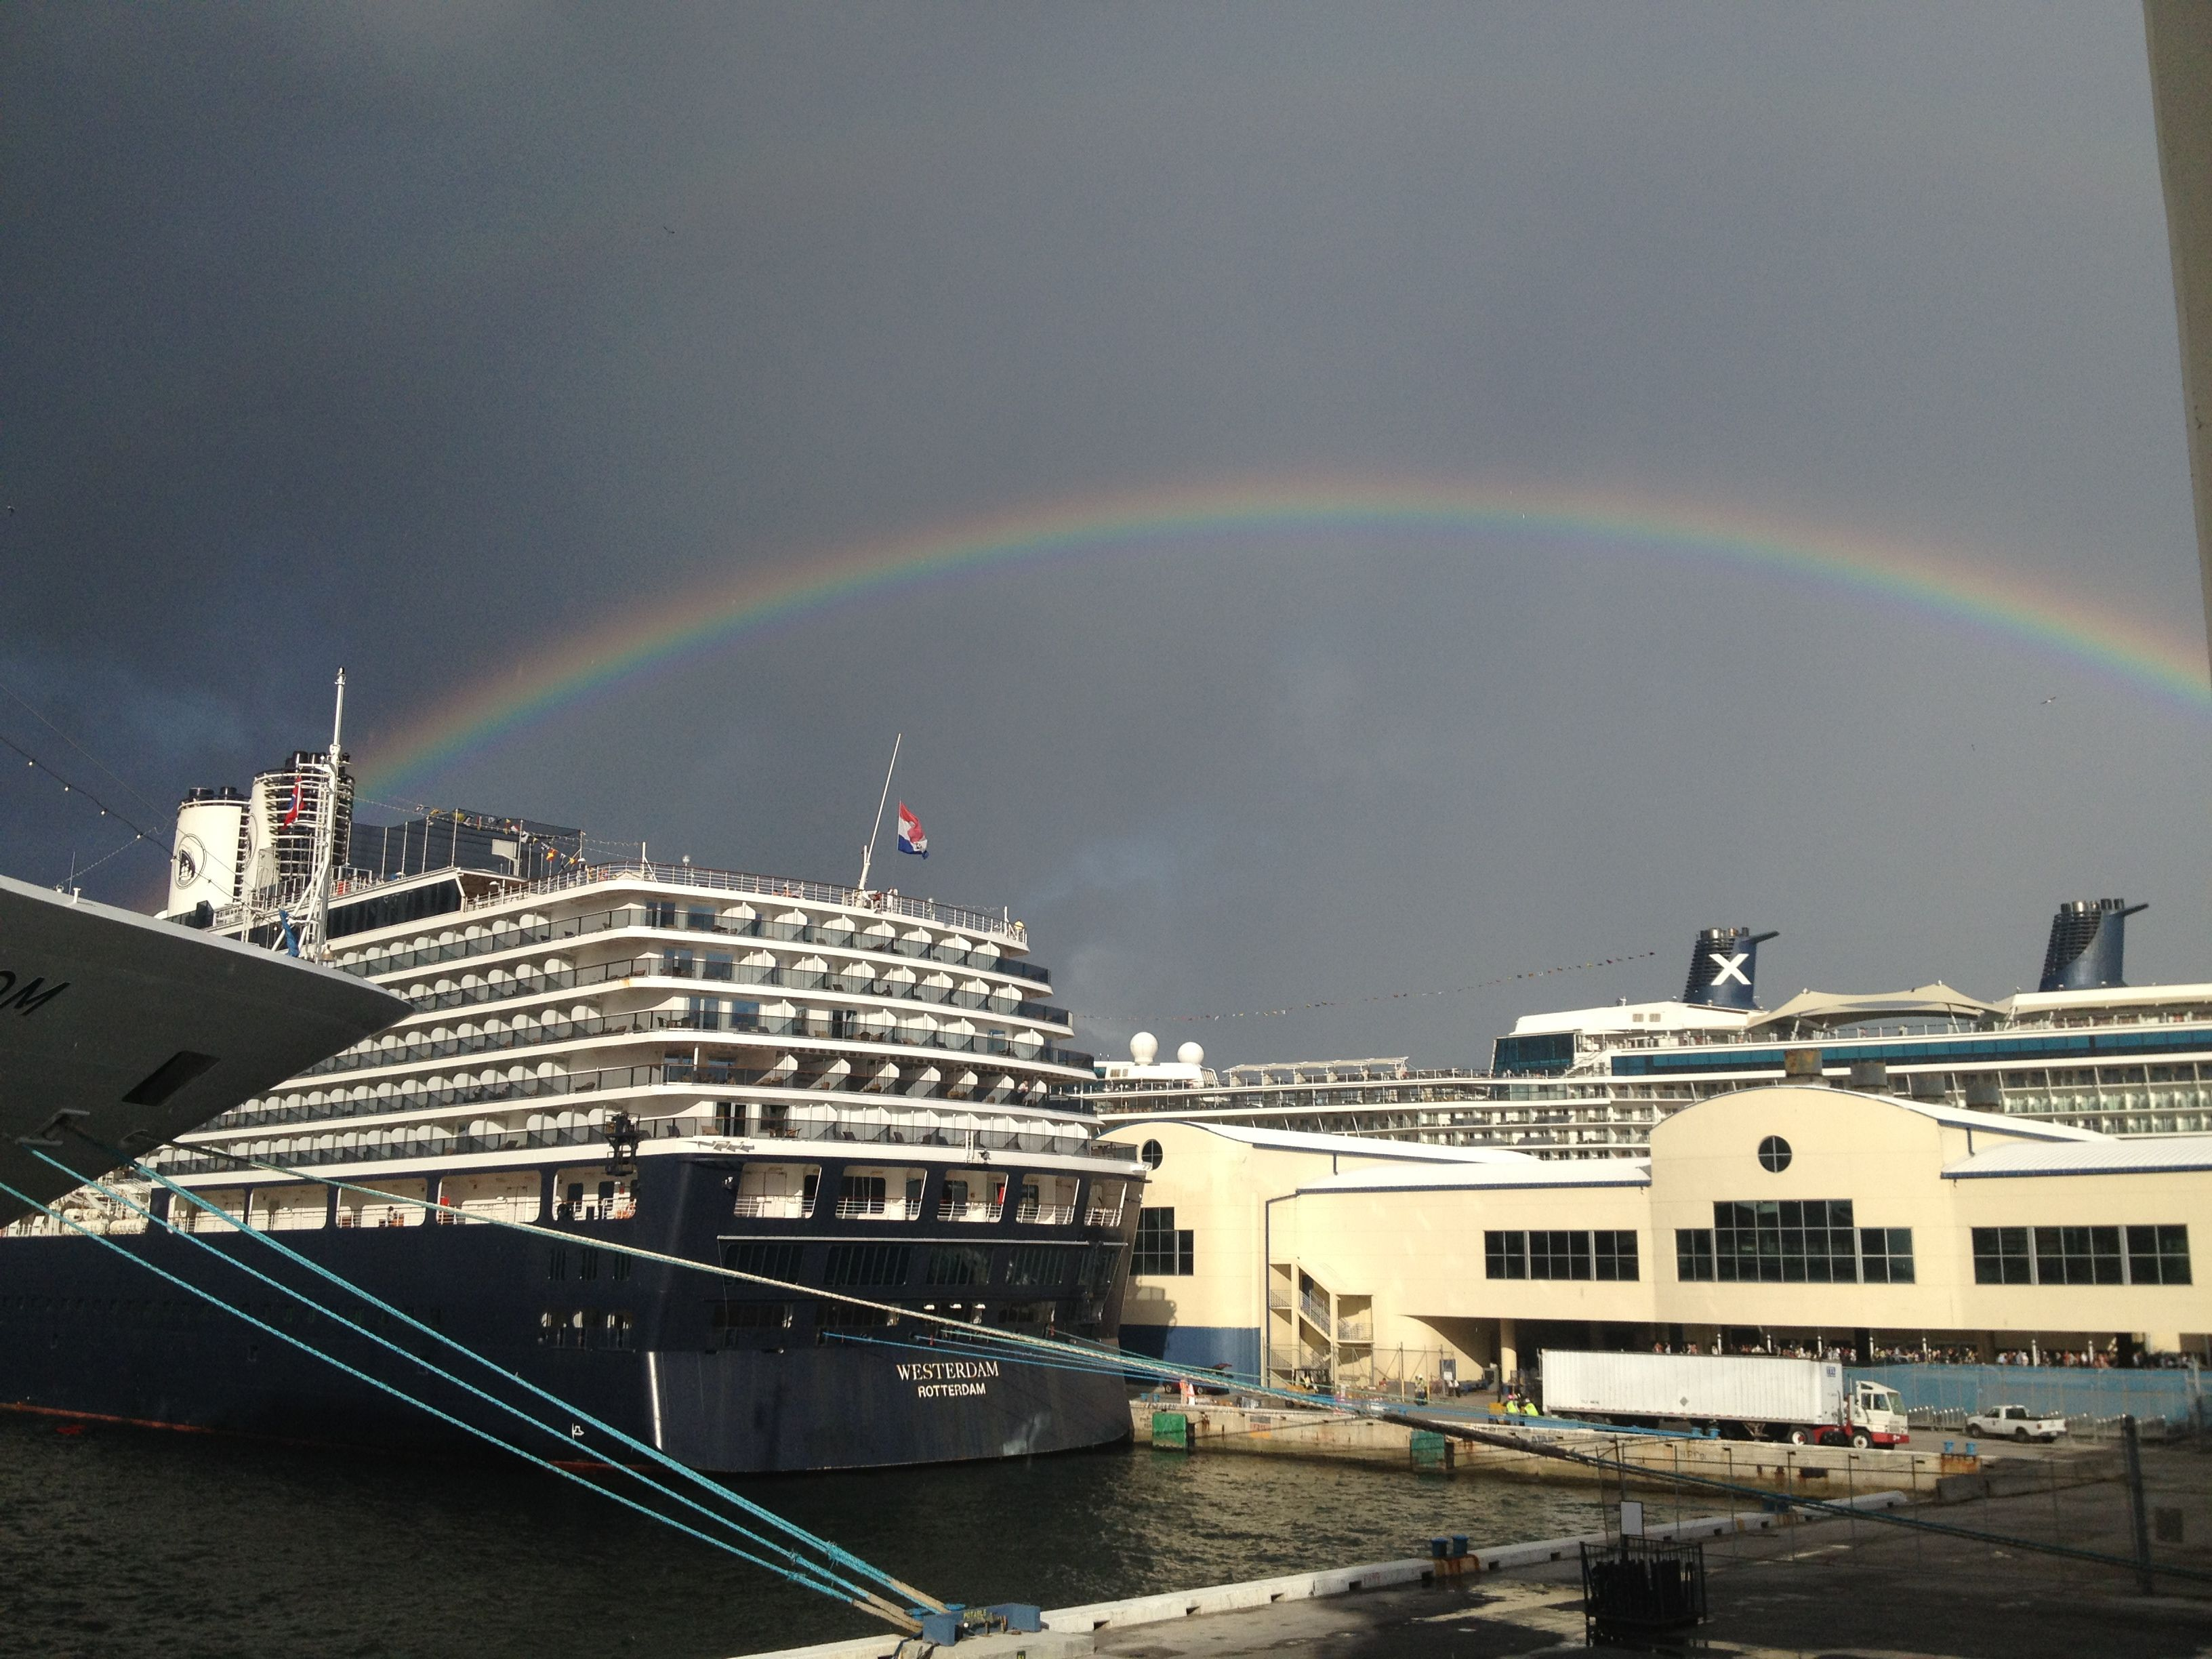 Port Everglades Florida Cruise Ships Under A Rainbow Cruise Vacation Cruise Ship Cruise Port